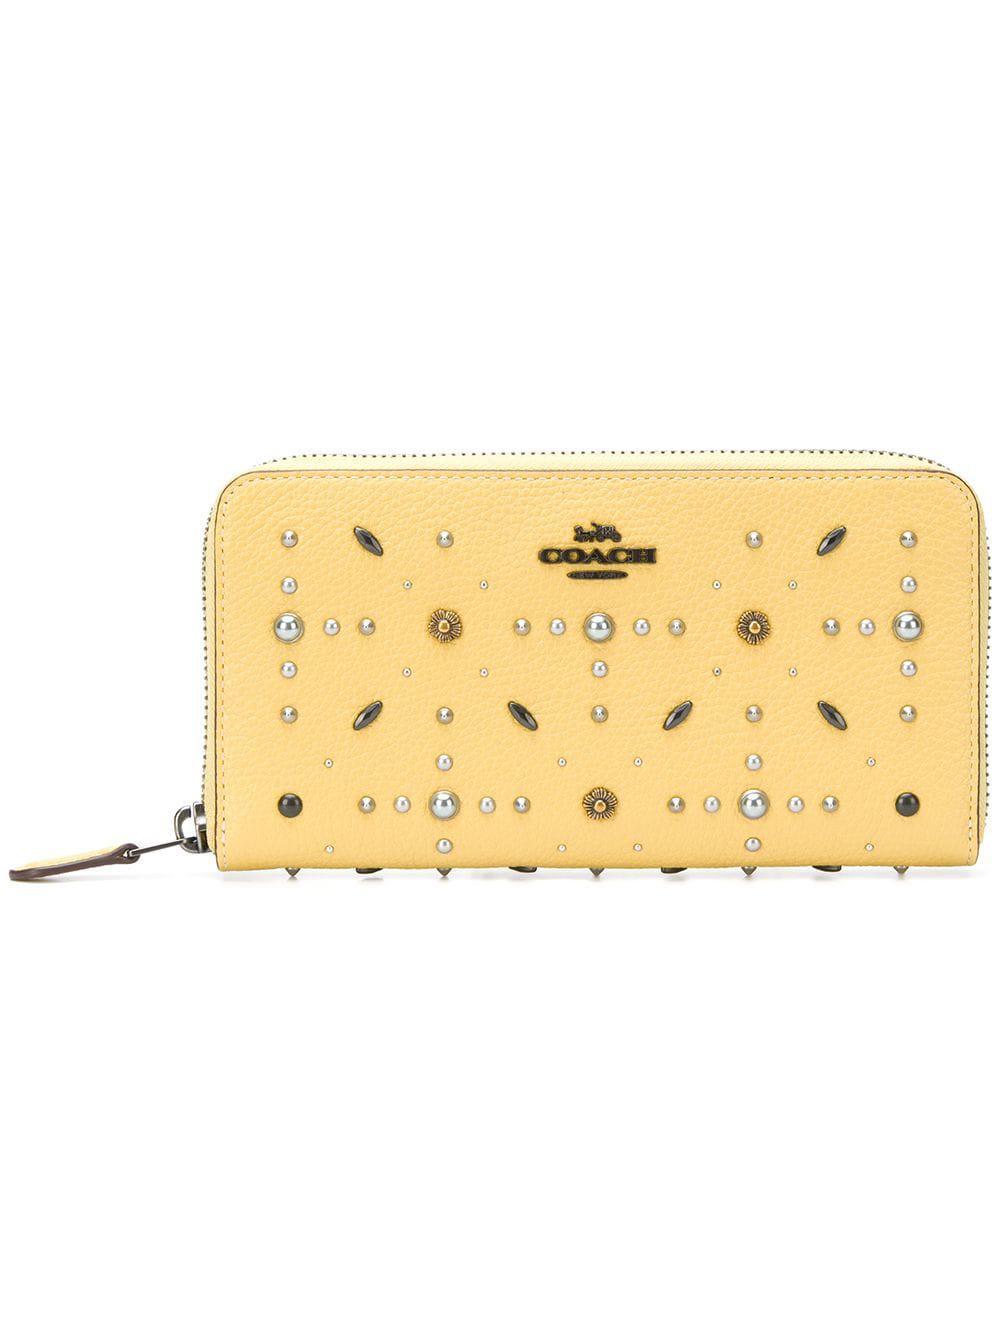 9599de2f22 COACH Prairie Rivet Accordion Zip Wallet - Lyst